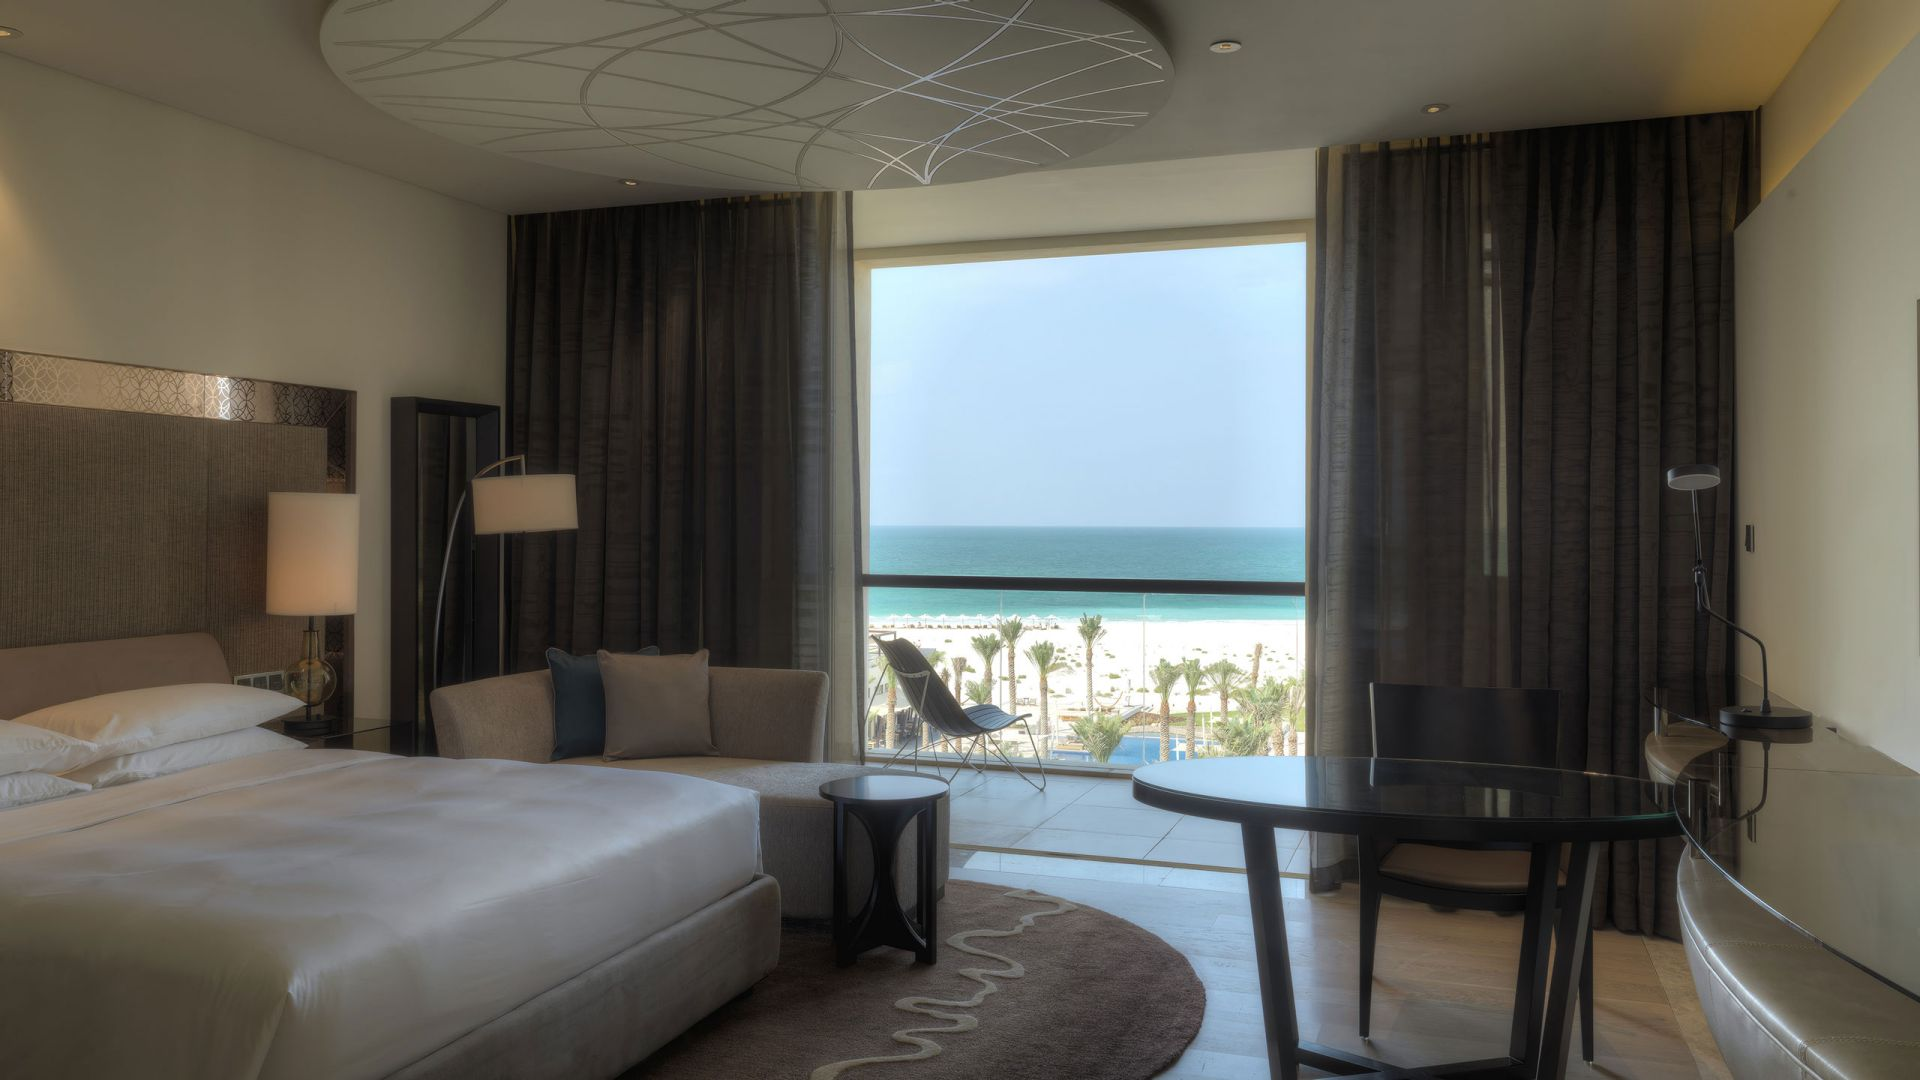 Seaview King Room